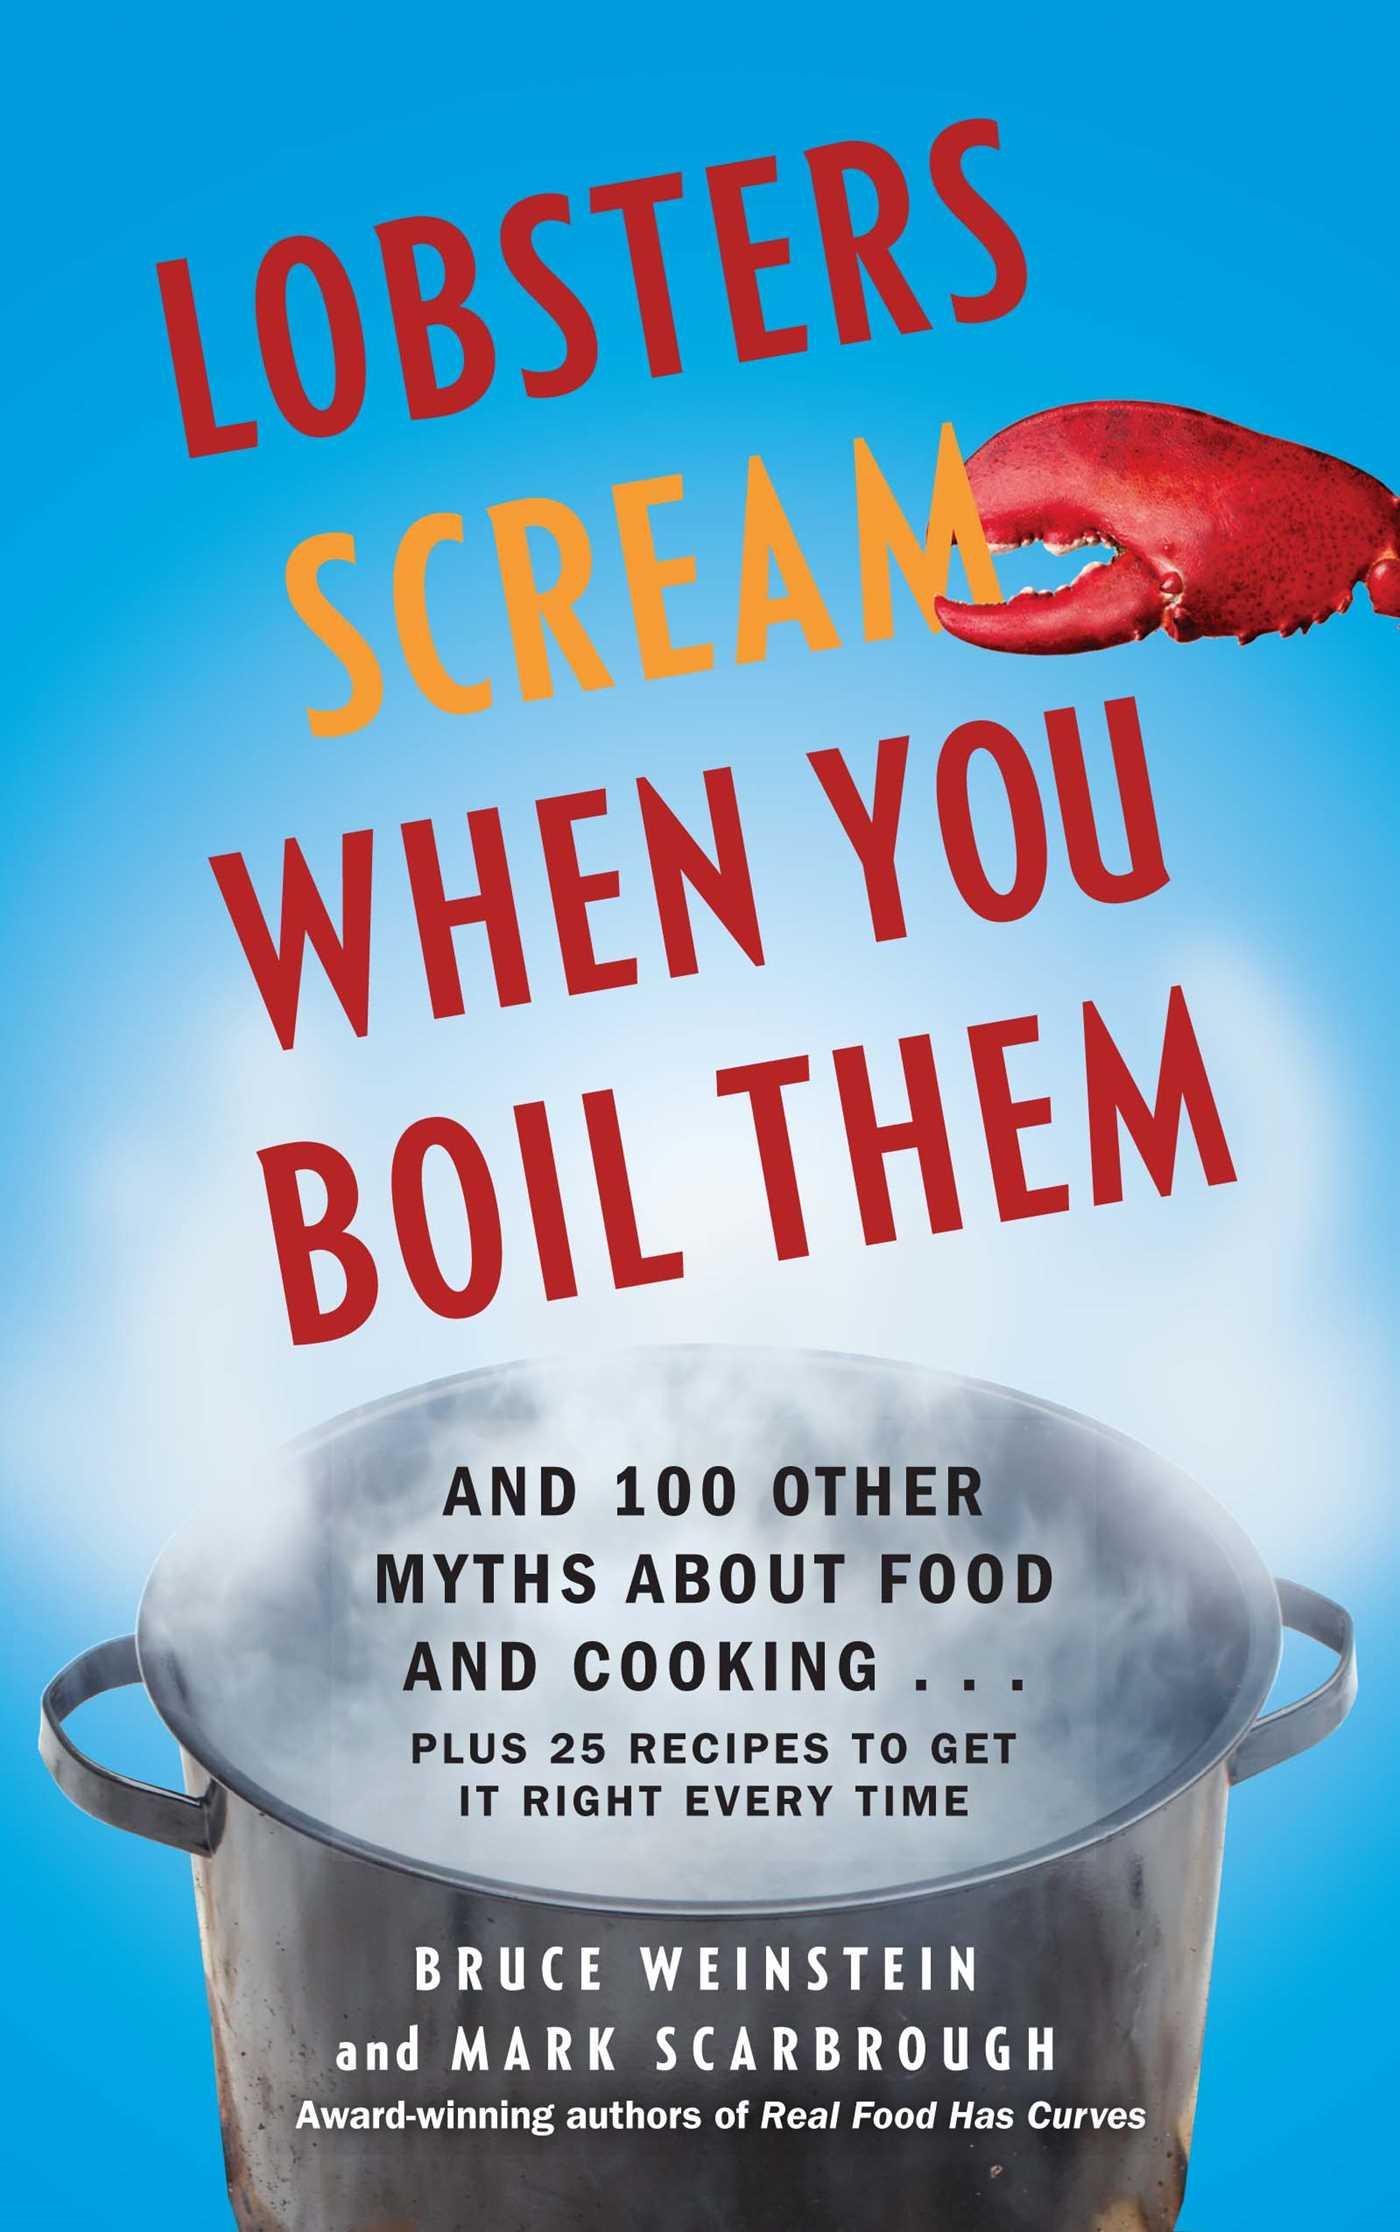 Lobsters scream when you boil them 9781439195376 hr